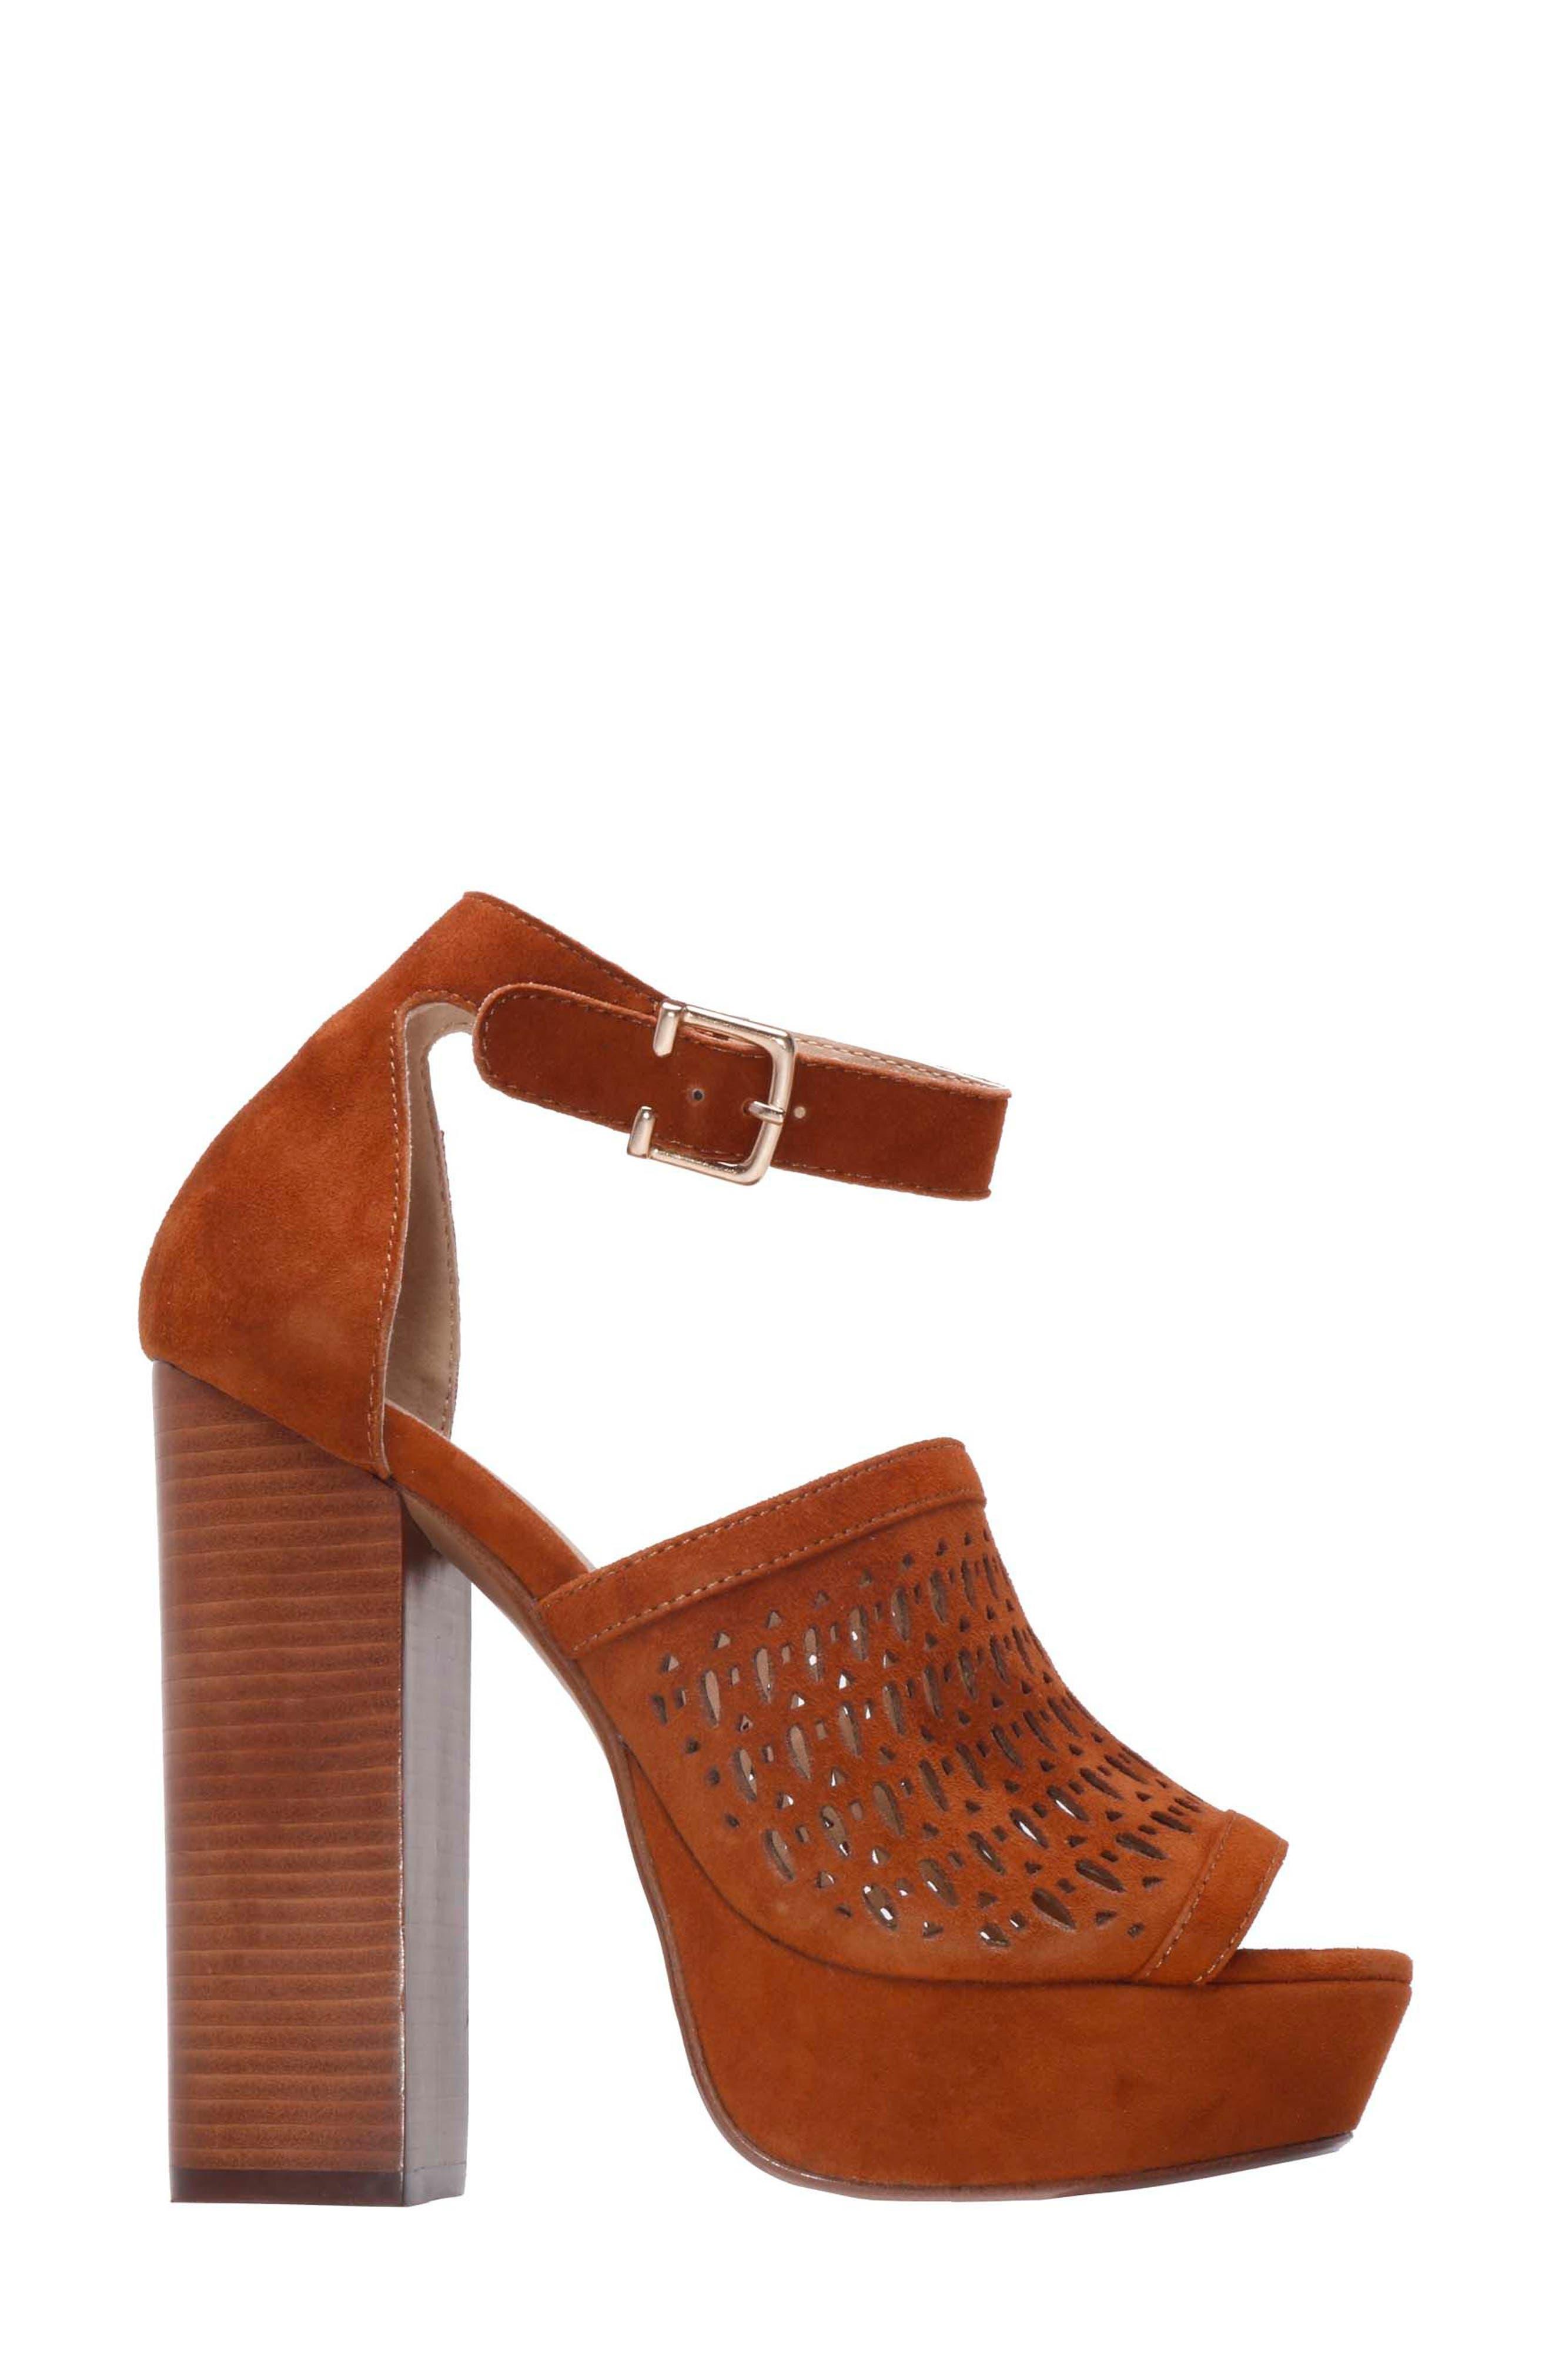 Lorne Platform Sandal,                             Alternate thumbnail 3, color,                             200